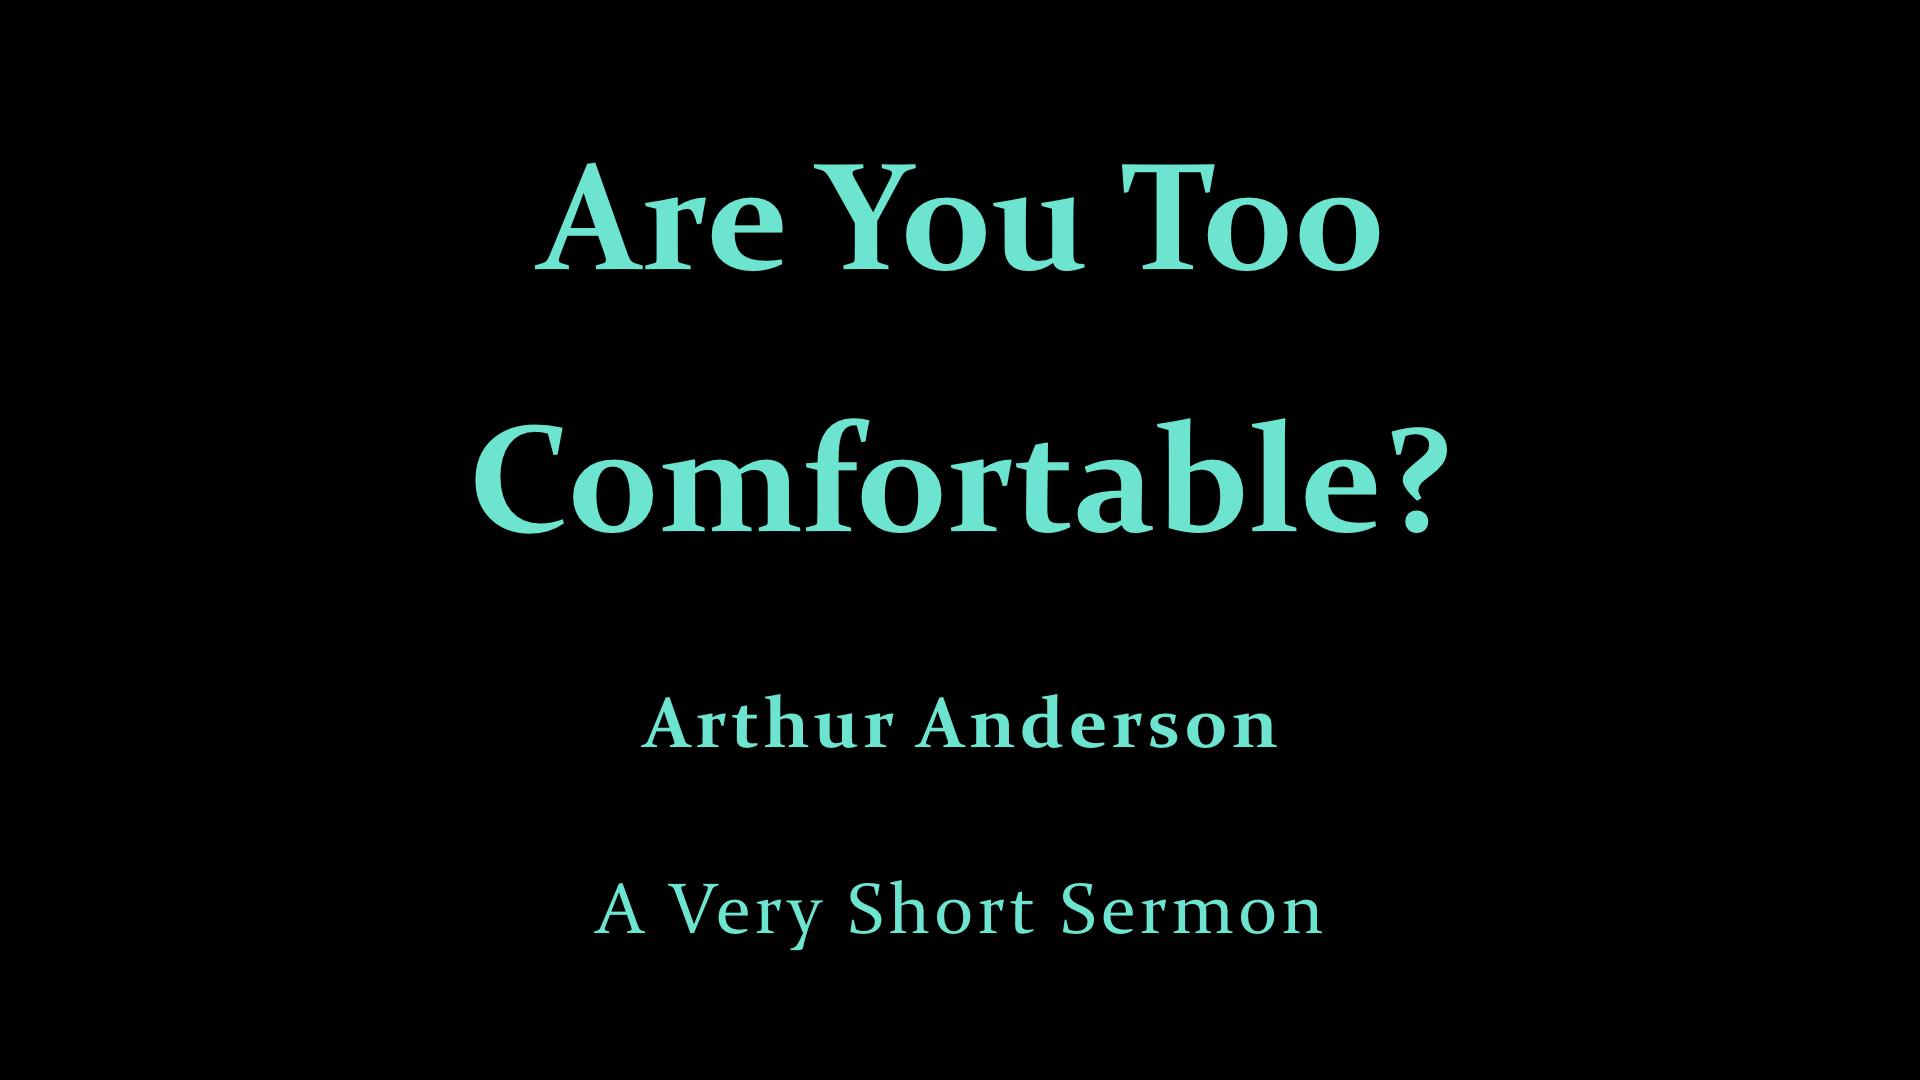 Arthur Anderson Invitation - Are You Too Comfortable?.jpeg